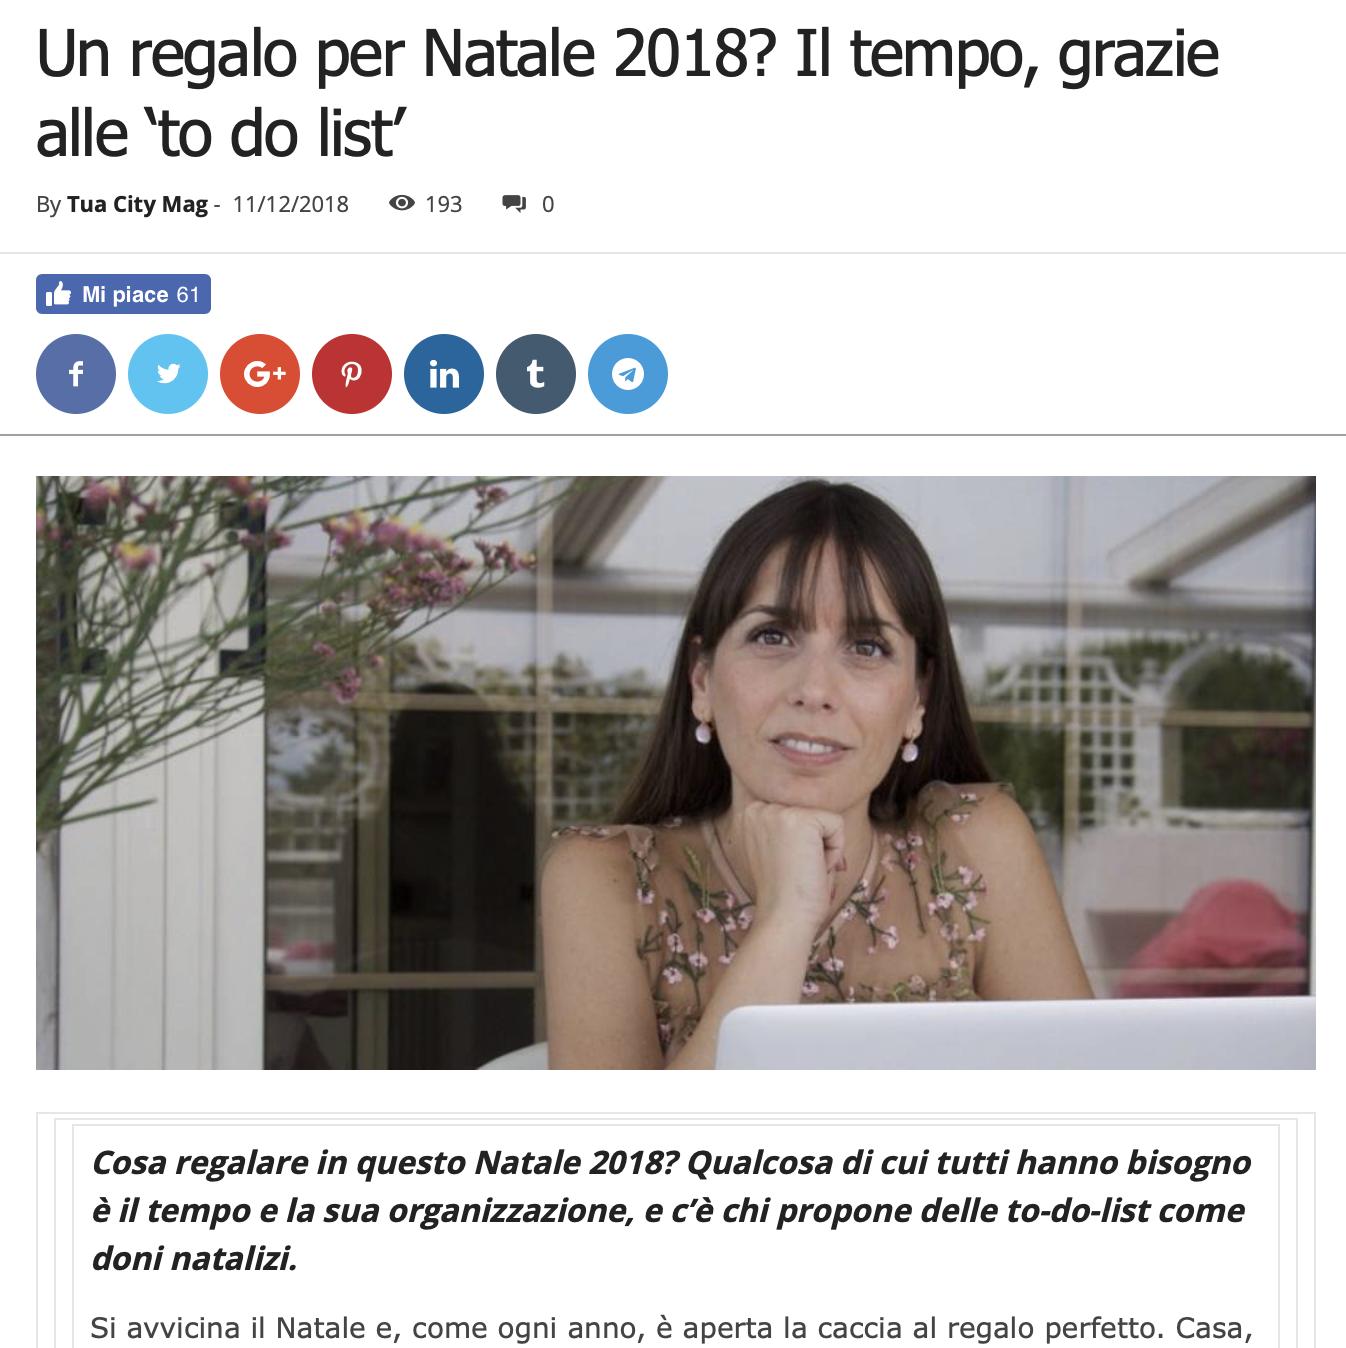 Viviana Grunert su TUACITYMAG-11.12.2018